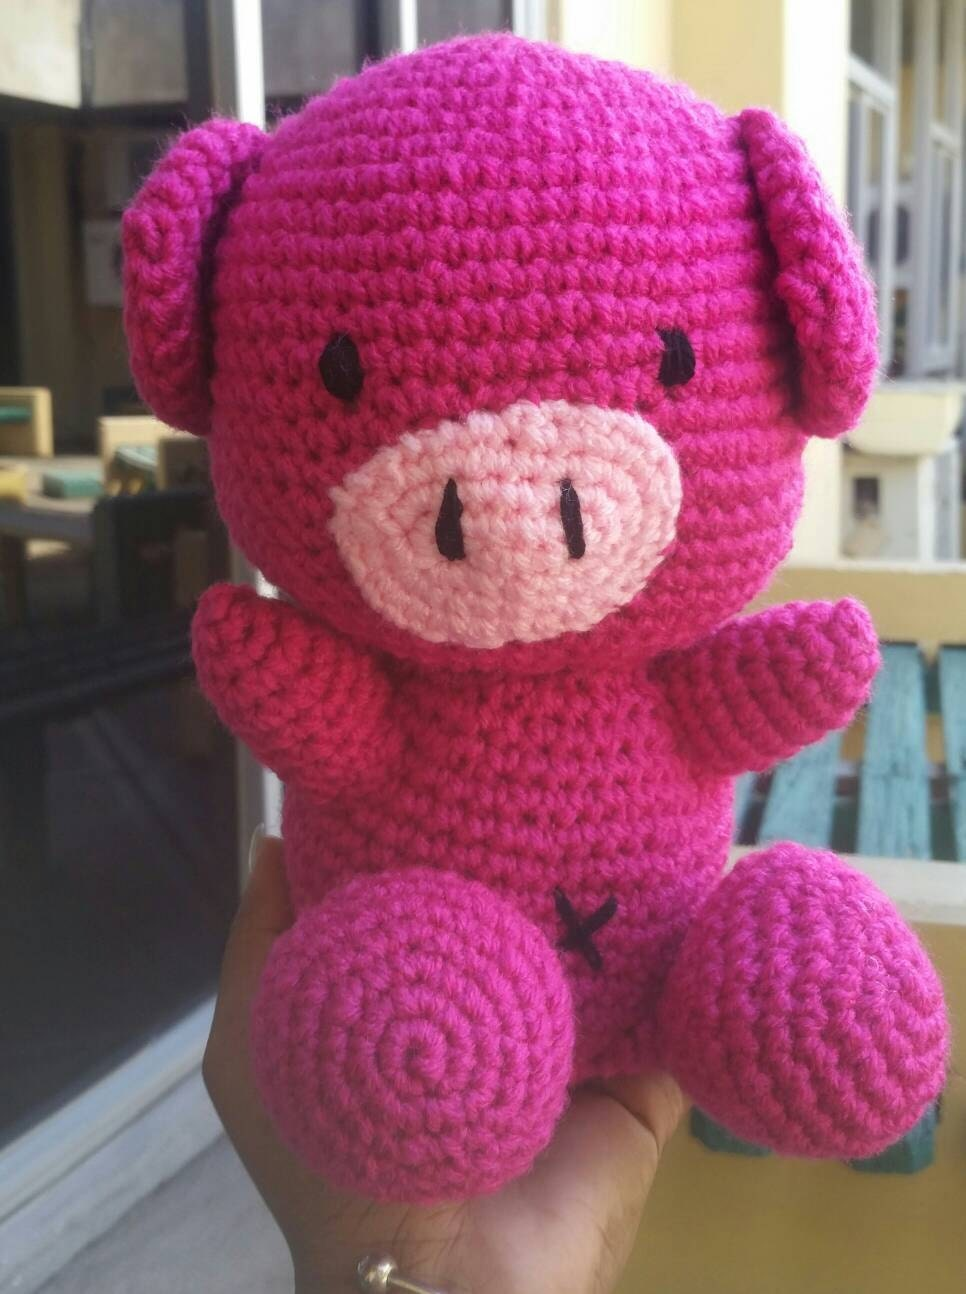 Amigurumi Crochet Toys : Crochet pig. Amigurumi pig. Amigurumi toys. Stuffed toys.